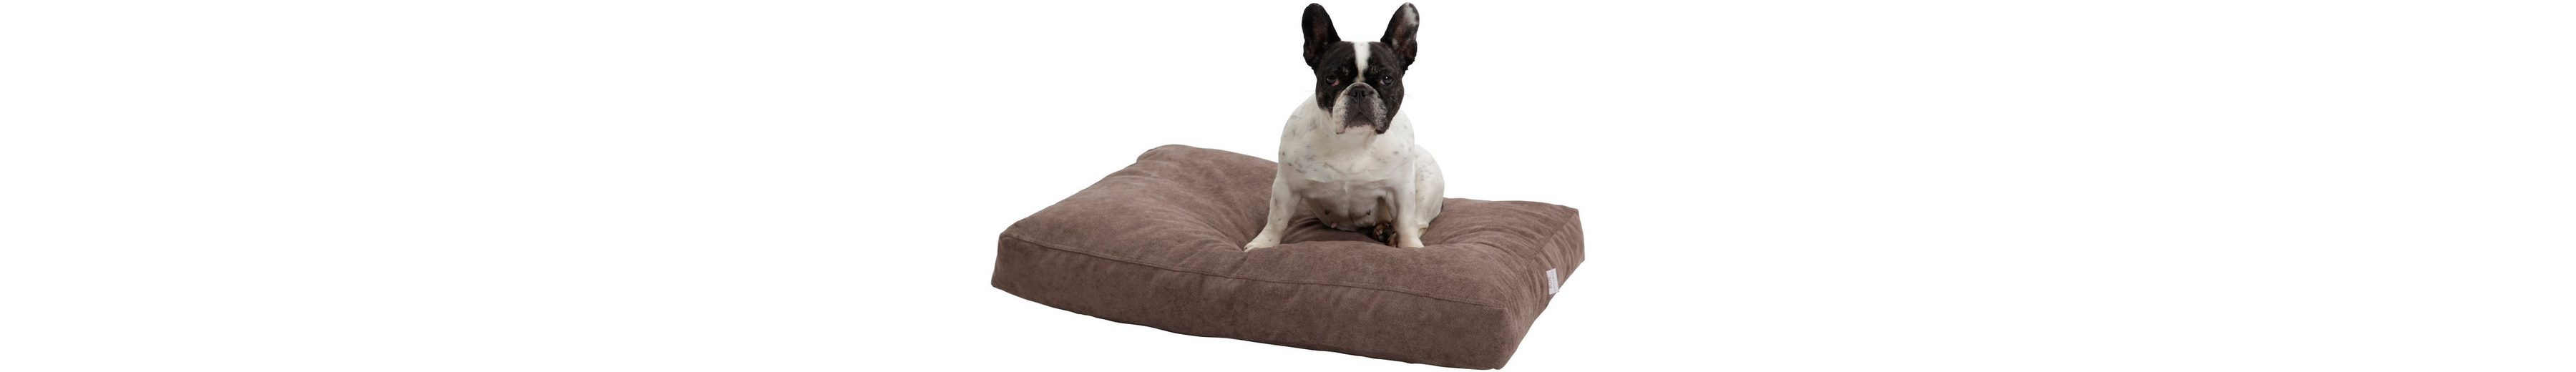 Hundekissen und Katzenkissen »Madison«, B/T/H: 80/60/10 cm, Braun